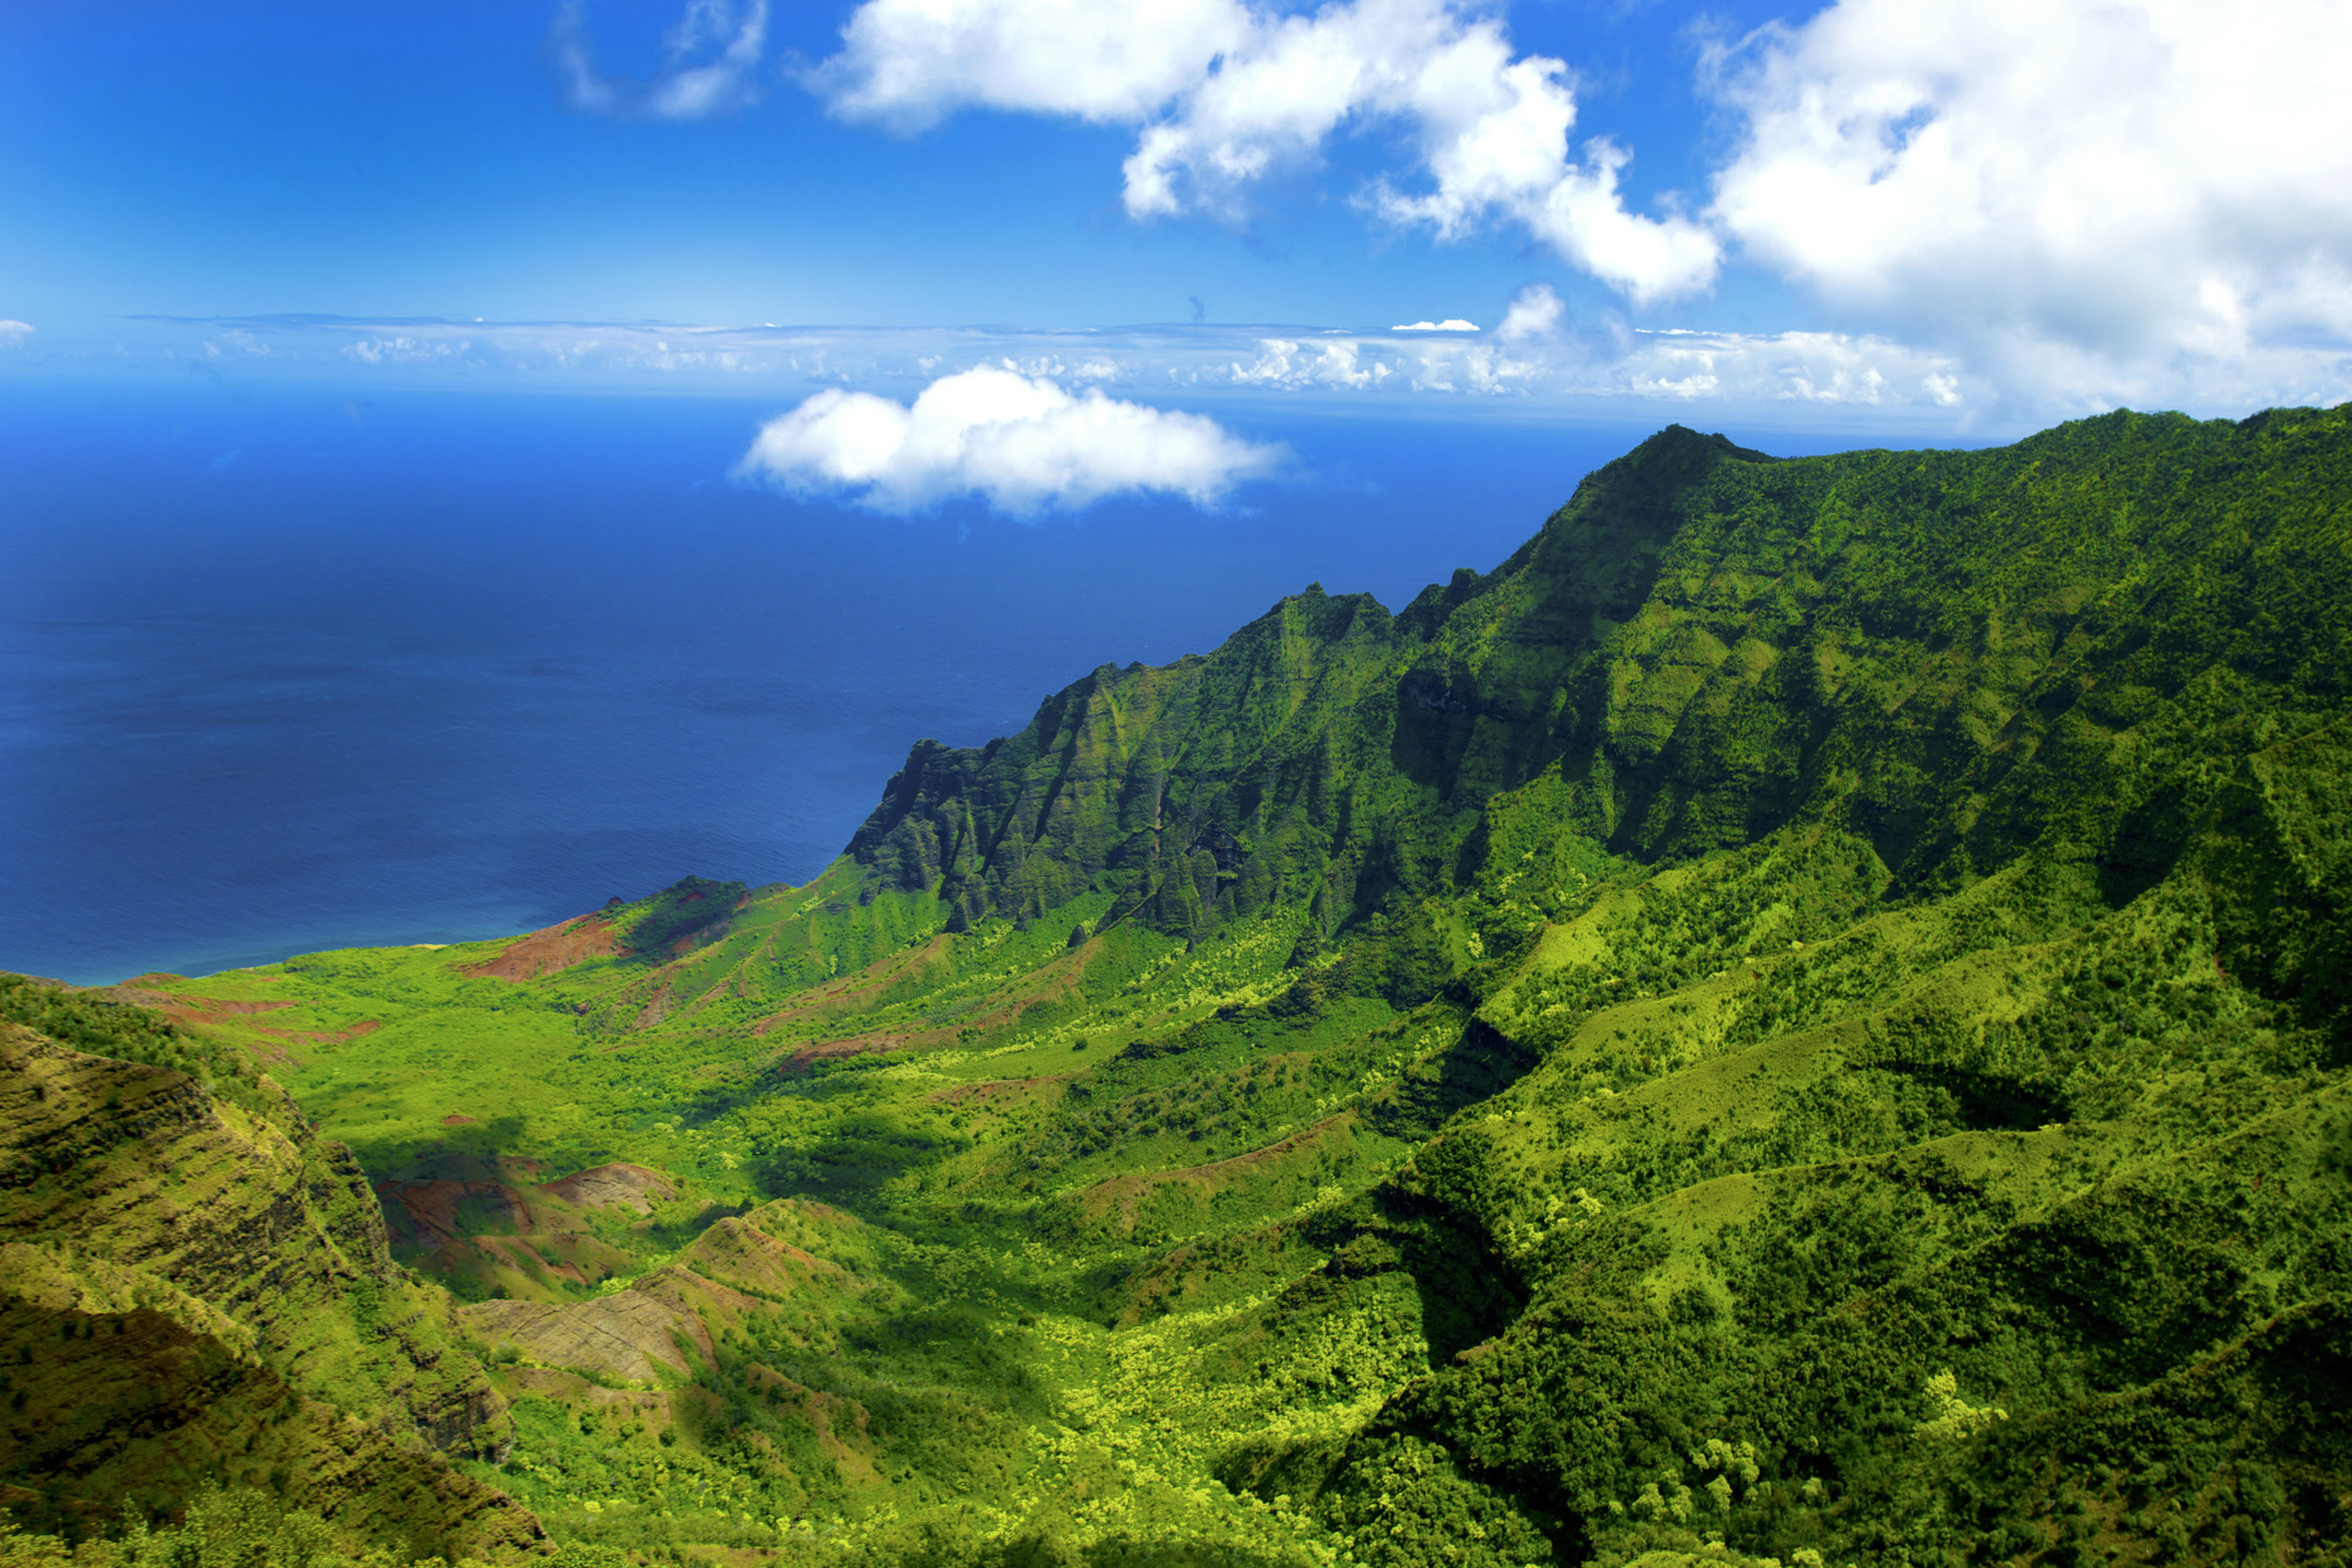 Breathtaking view of Kalalau Valley from the Kalalau Lookout within the Kokee State Park. Image Credit: Kauai Visitors Bureau, Kicka Witte